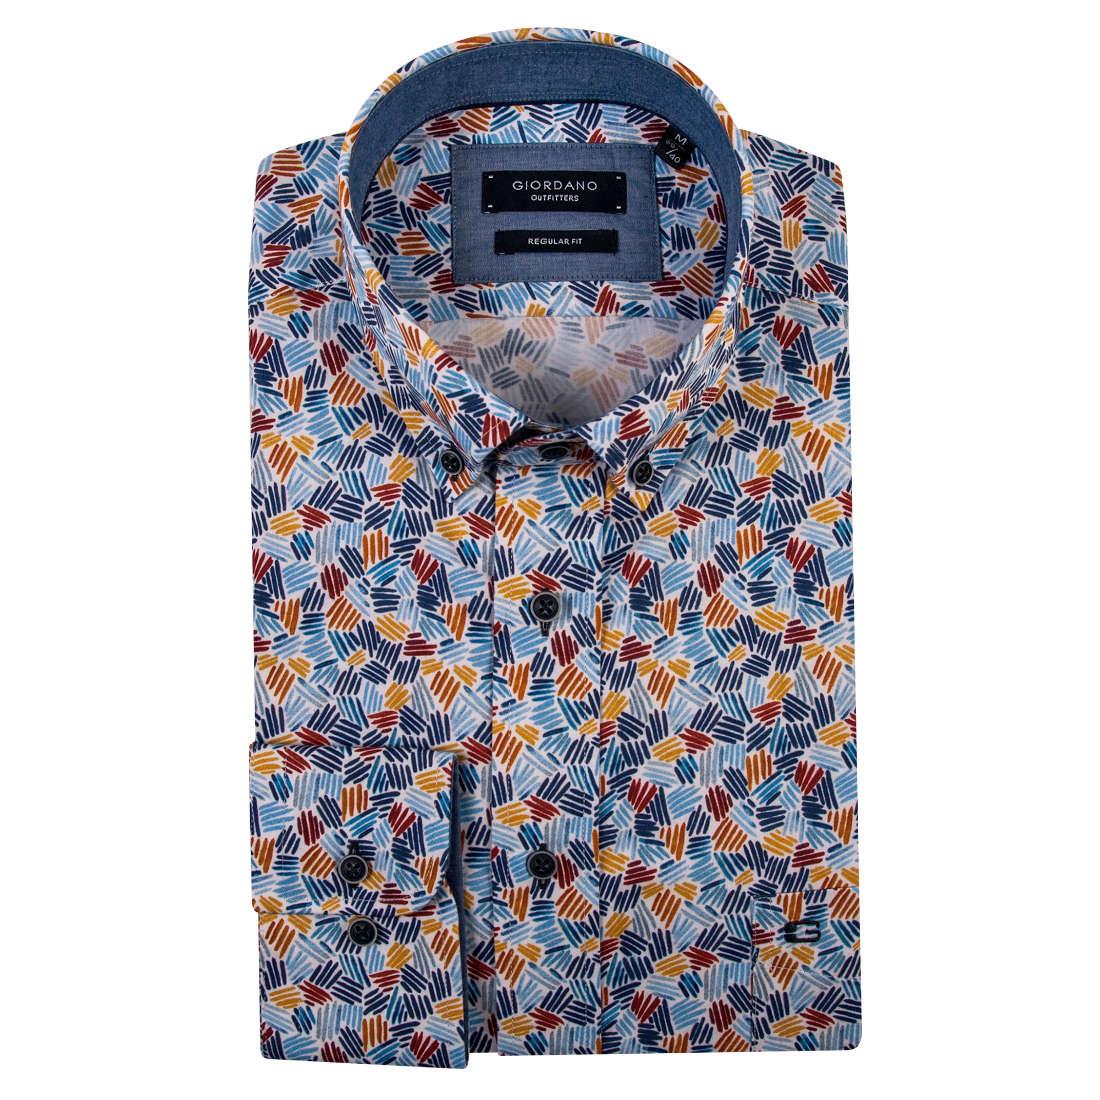 Giordano overhemd Regular Fit 91-6020 in het Blauw